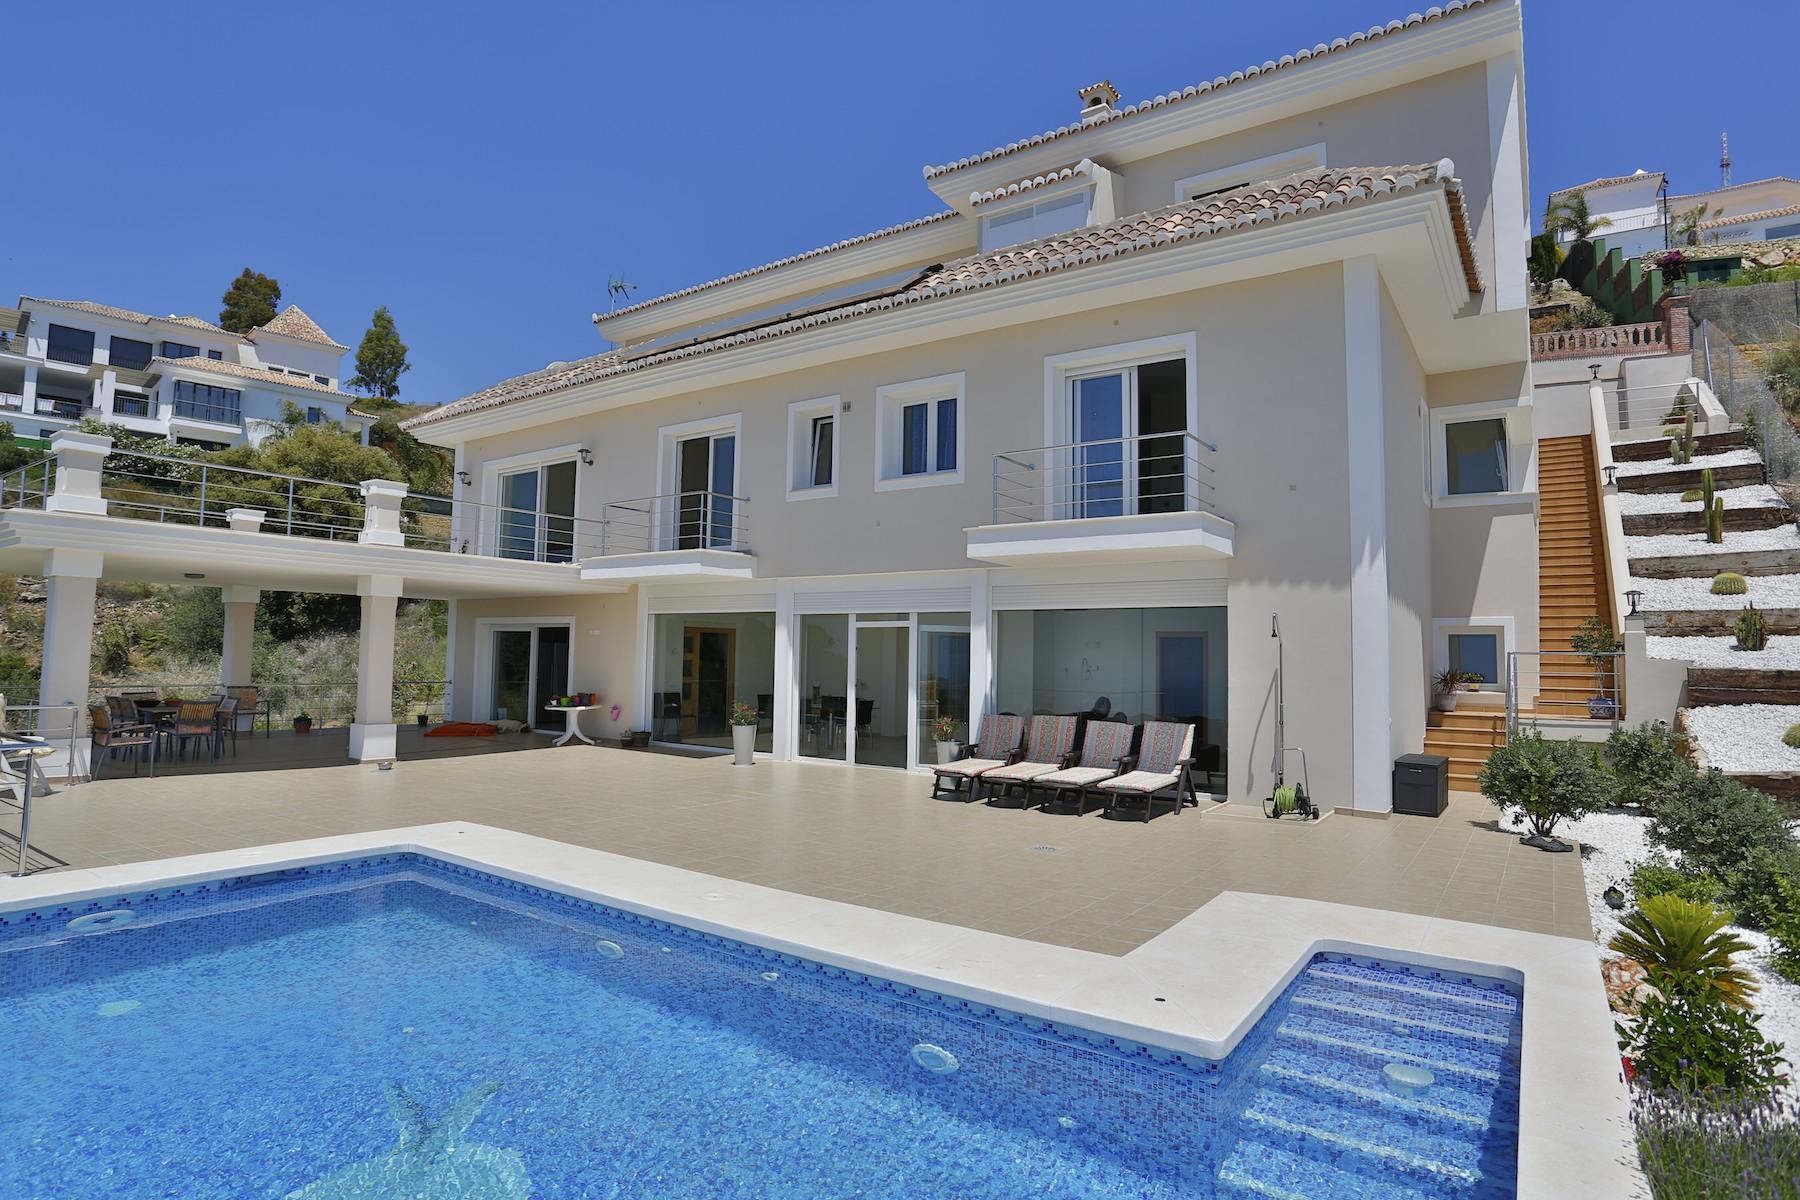 Nhà ở một gia đình vì Bán tại Modern Style villa Altos de Los Monteros Marbella, Costa Del Sol, 29600 Tây Ban Nha